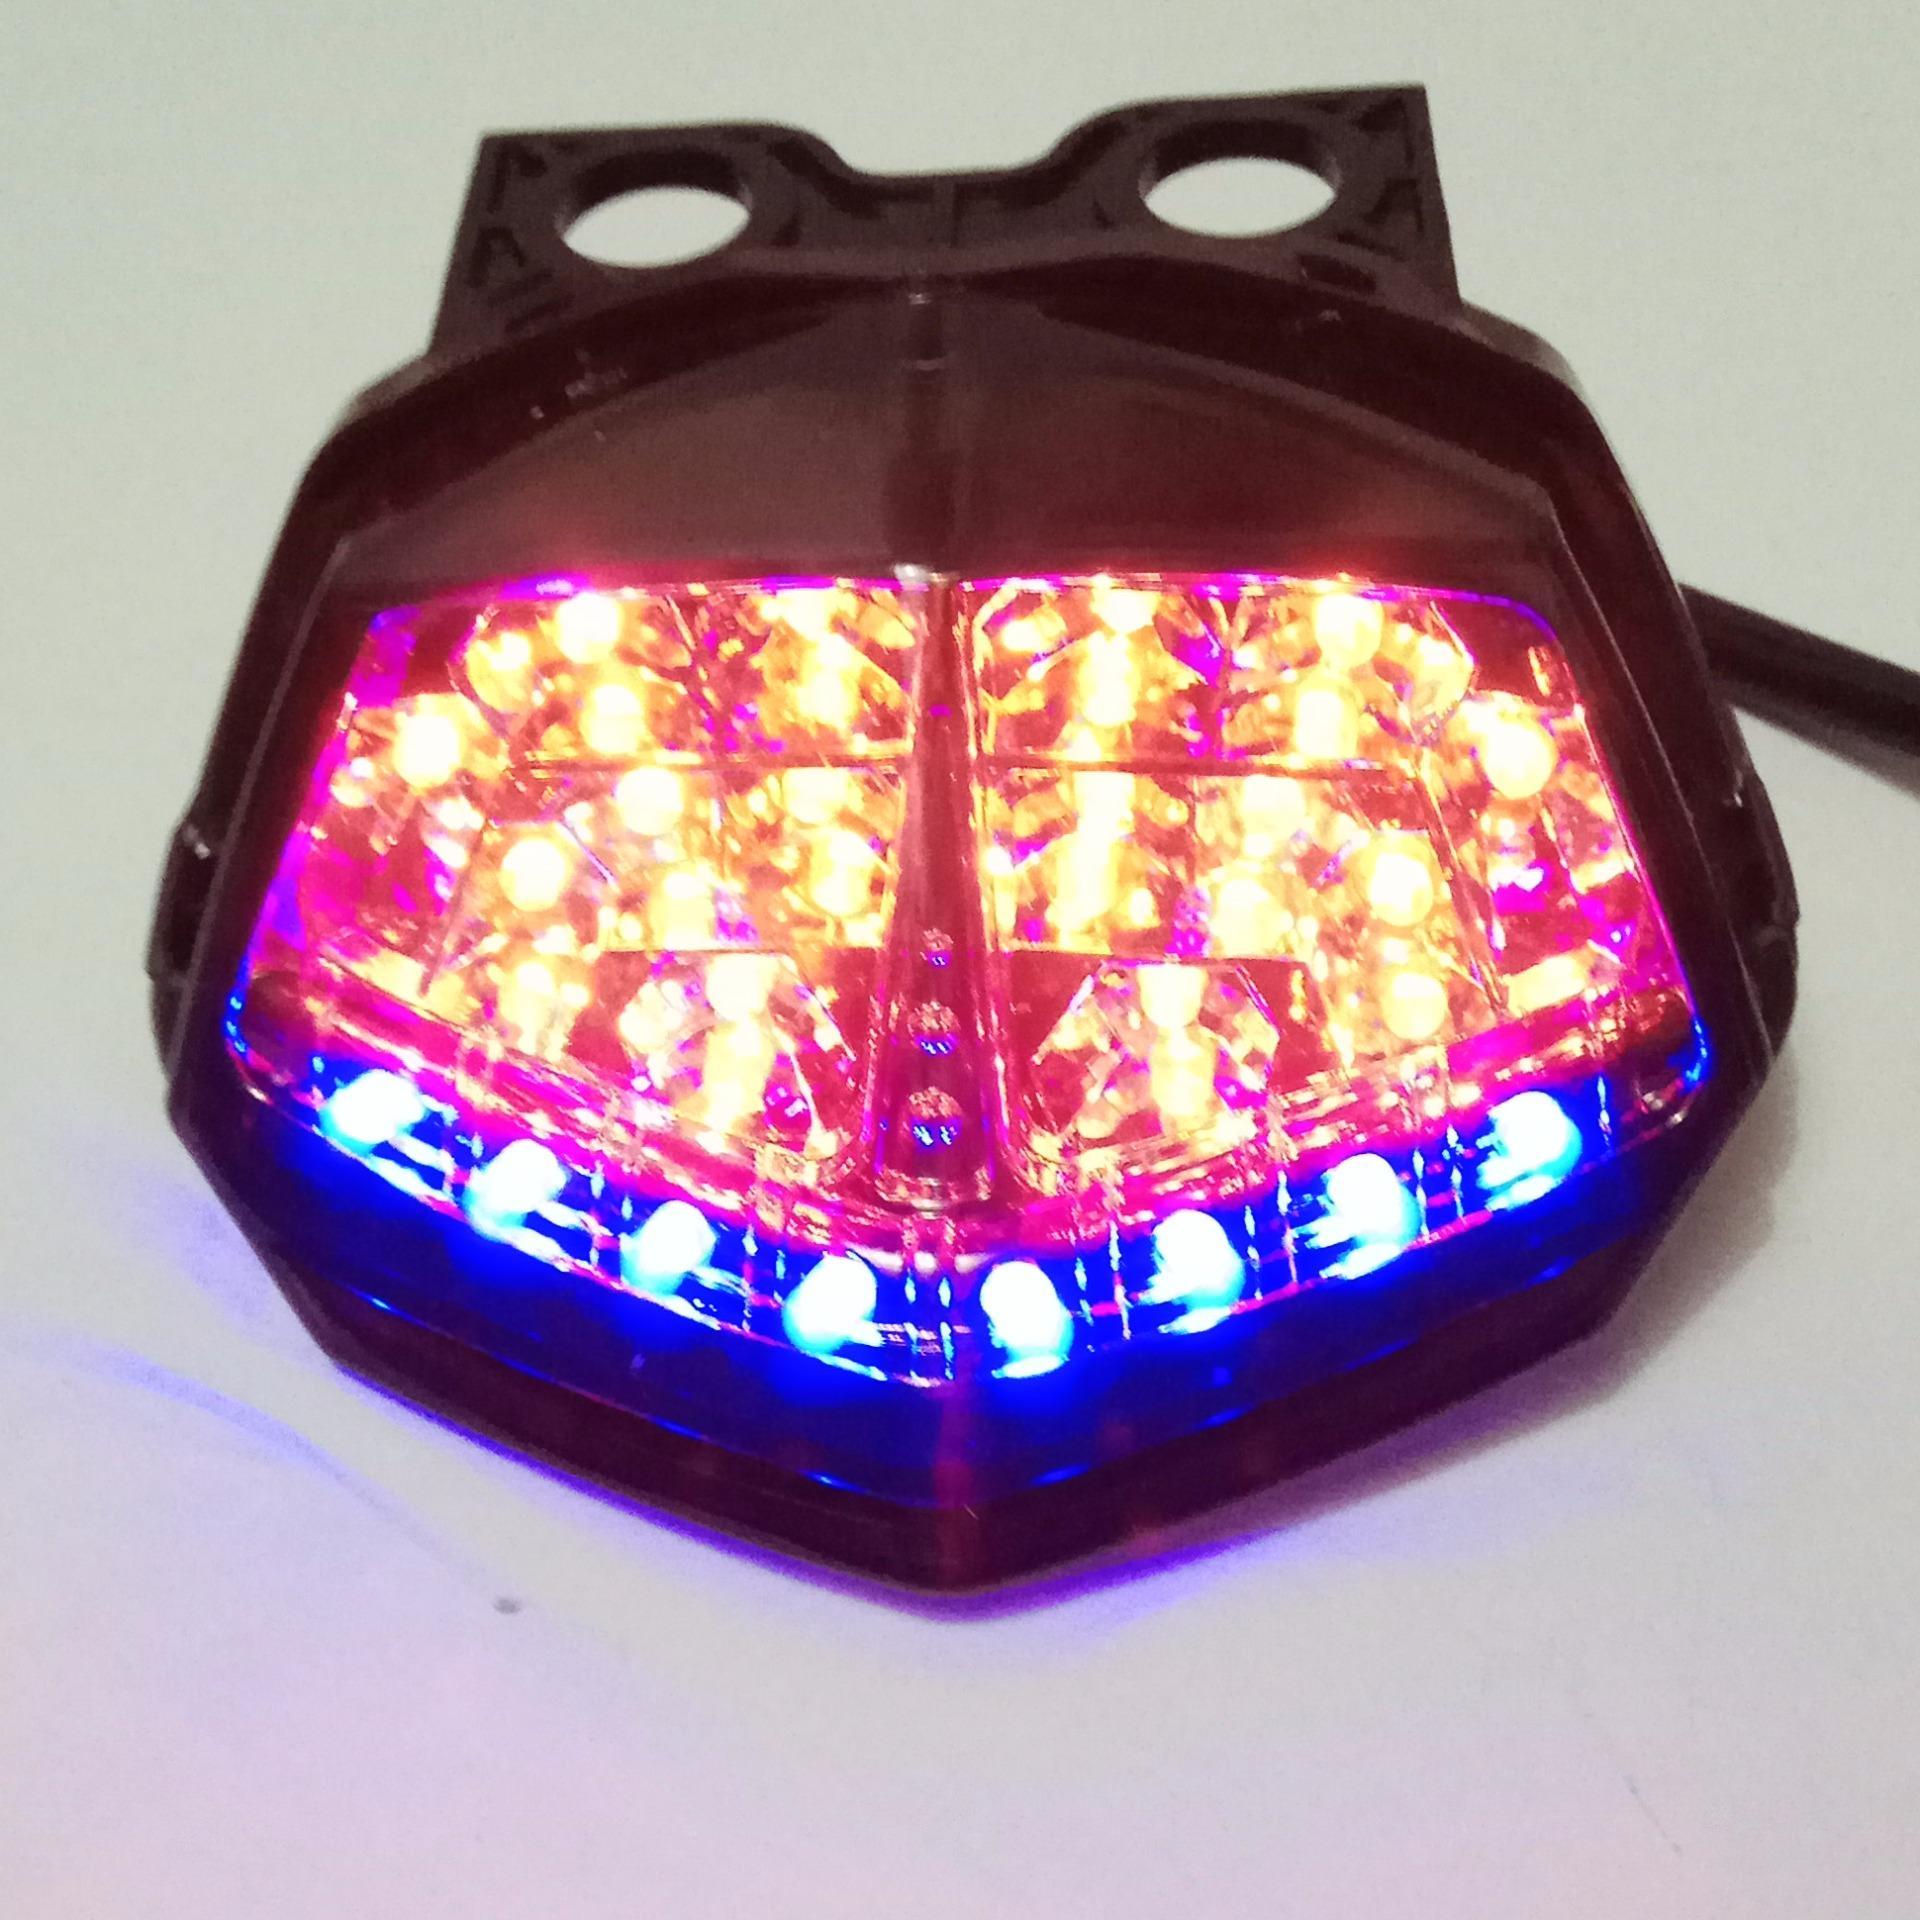 ... Tempel Mini 621 Yamaha R15 Kuning ... - Lampu Sen Sein Model New Cb150r Gma Universal Stok Terbatas. Source · lampu stop ninja 250 karbu & ninja 150RR ...